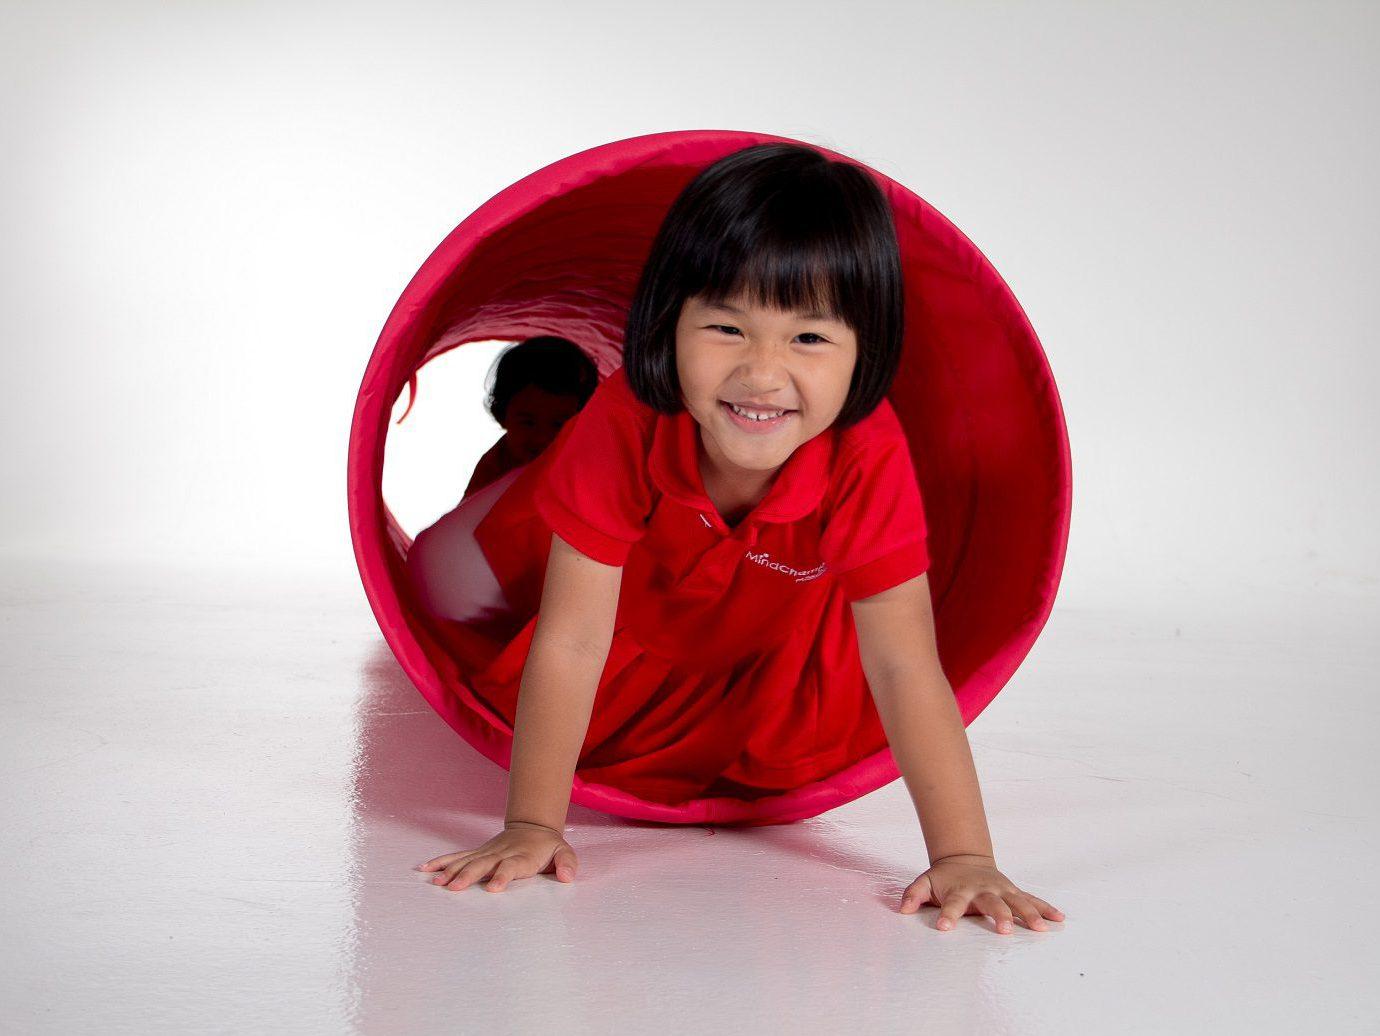 bukit batok childcare